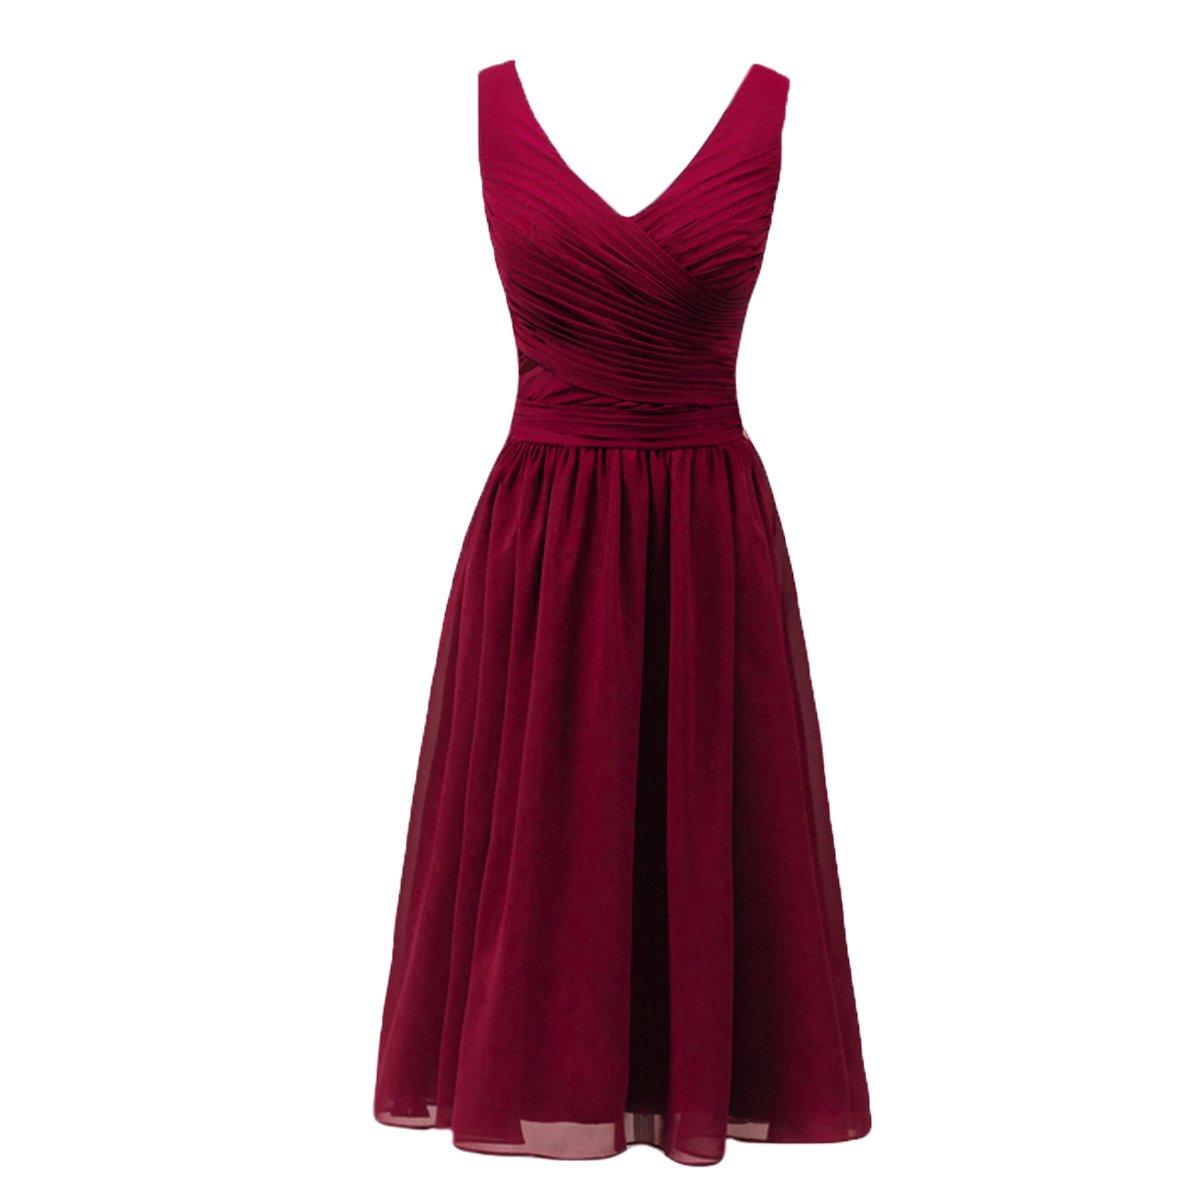 Bridal Mall Damen Kleid rosa Burgunderrot 46  Amazon.de  Bekleidung 1847d79092